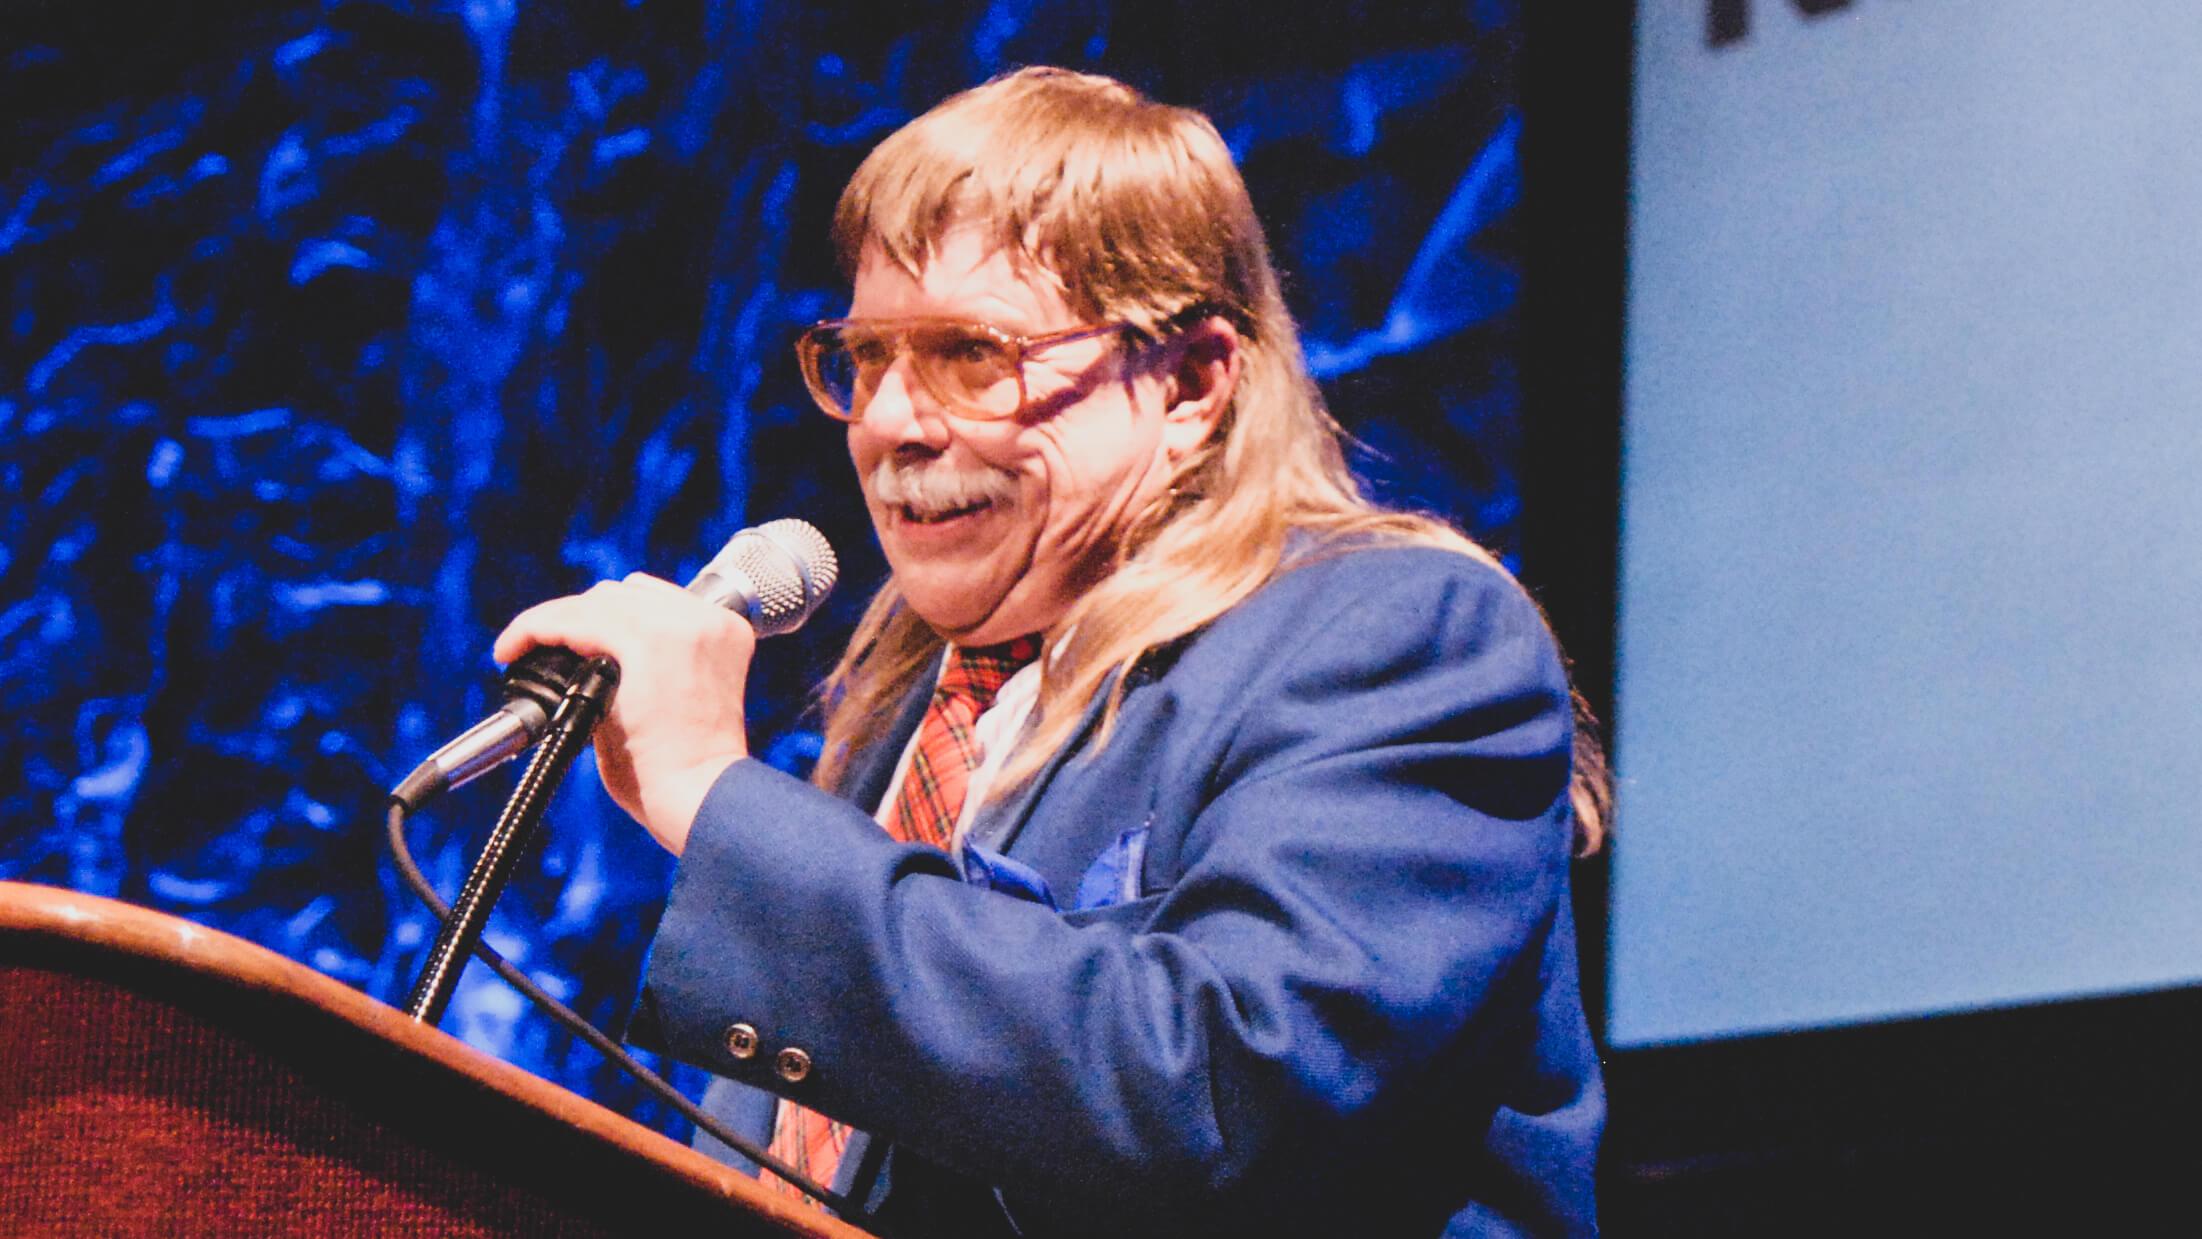 Ken Norman ushered brass arrangements and performance into a new era